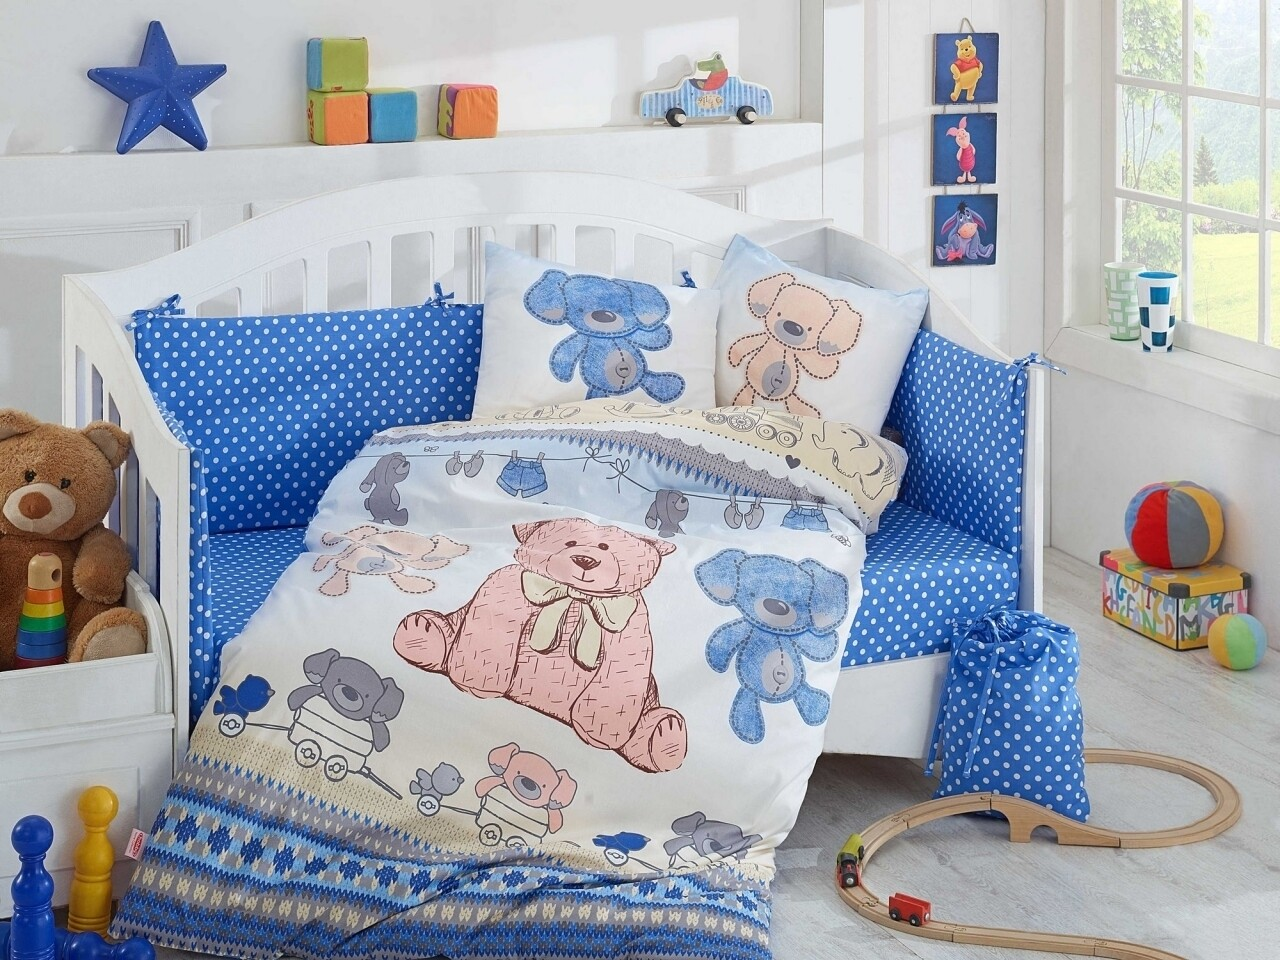 Lenjerie de pat pentru copii, 4 piese, 100% bumbac poplin, Hobby, Tombik, albastru